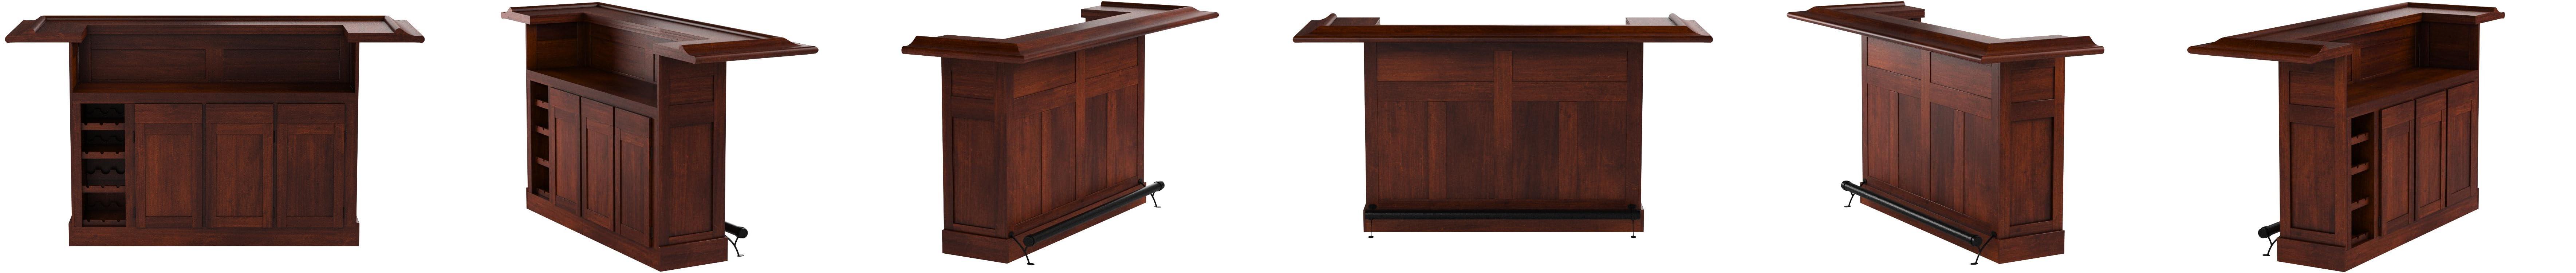 Cherry Finish Hillsdale Furniture 62578ACHE Classic Bar Large